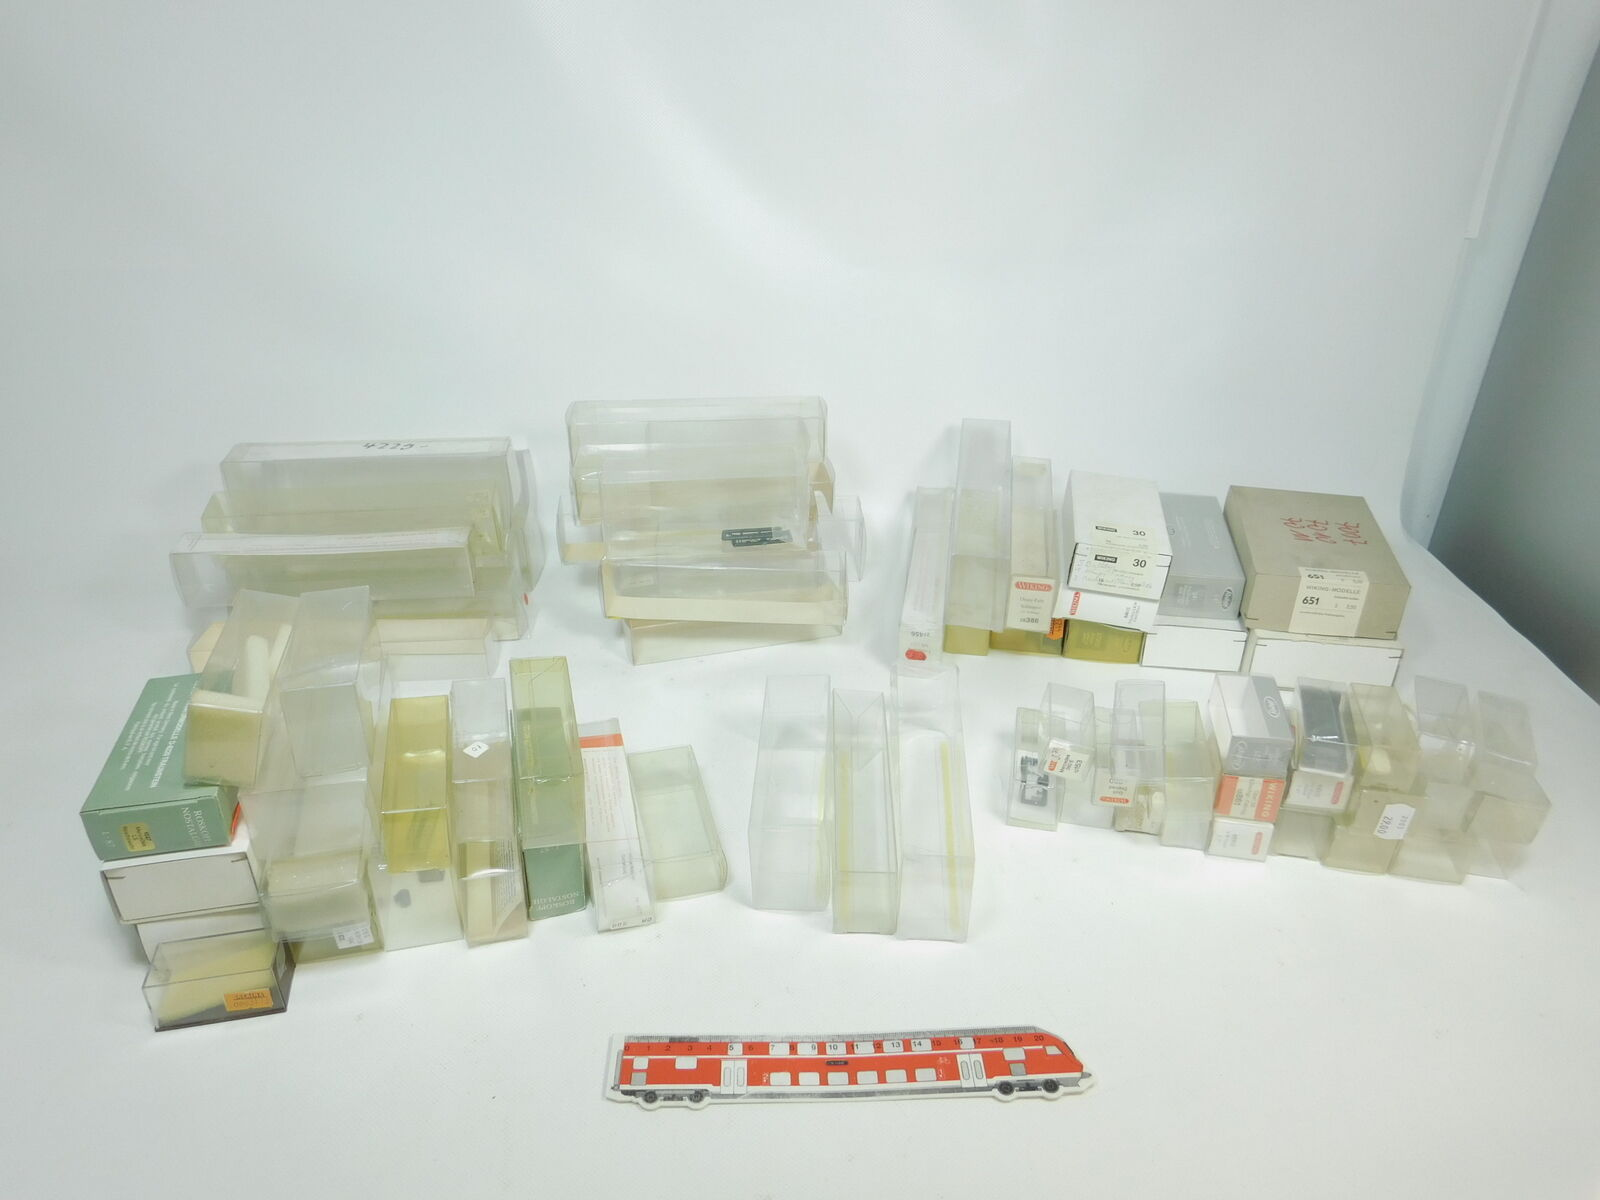 Bk125-3 X H0 klarsichtshülle RETAIL BOX EMPTY (Wiking, Roskopf Brekina etc. )